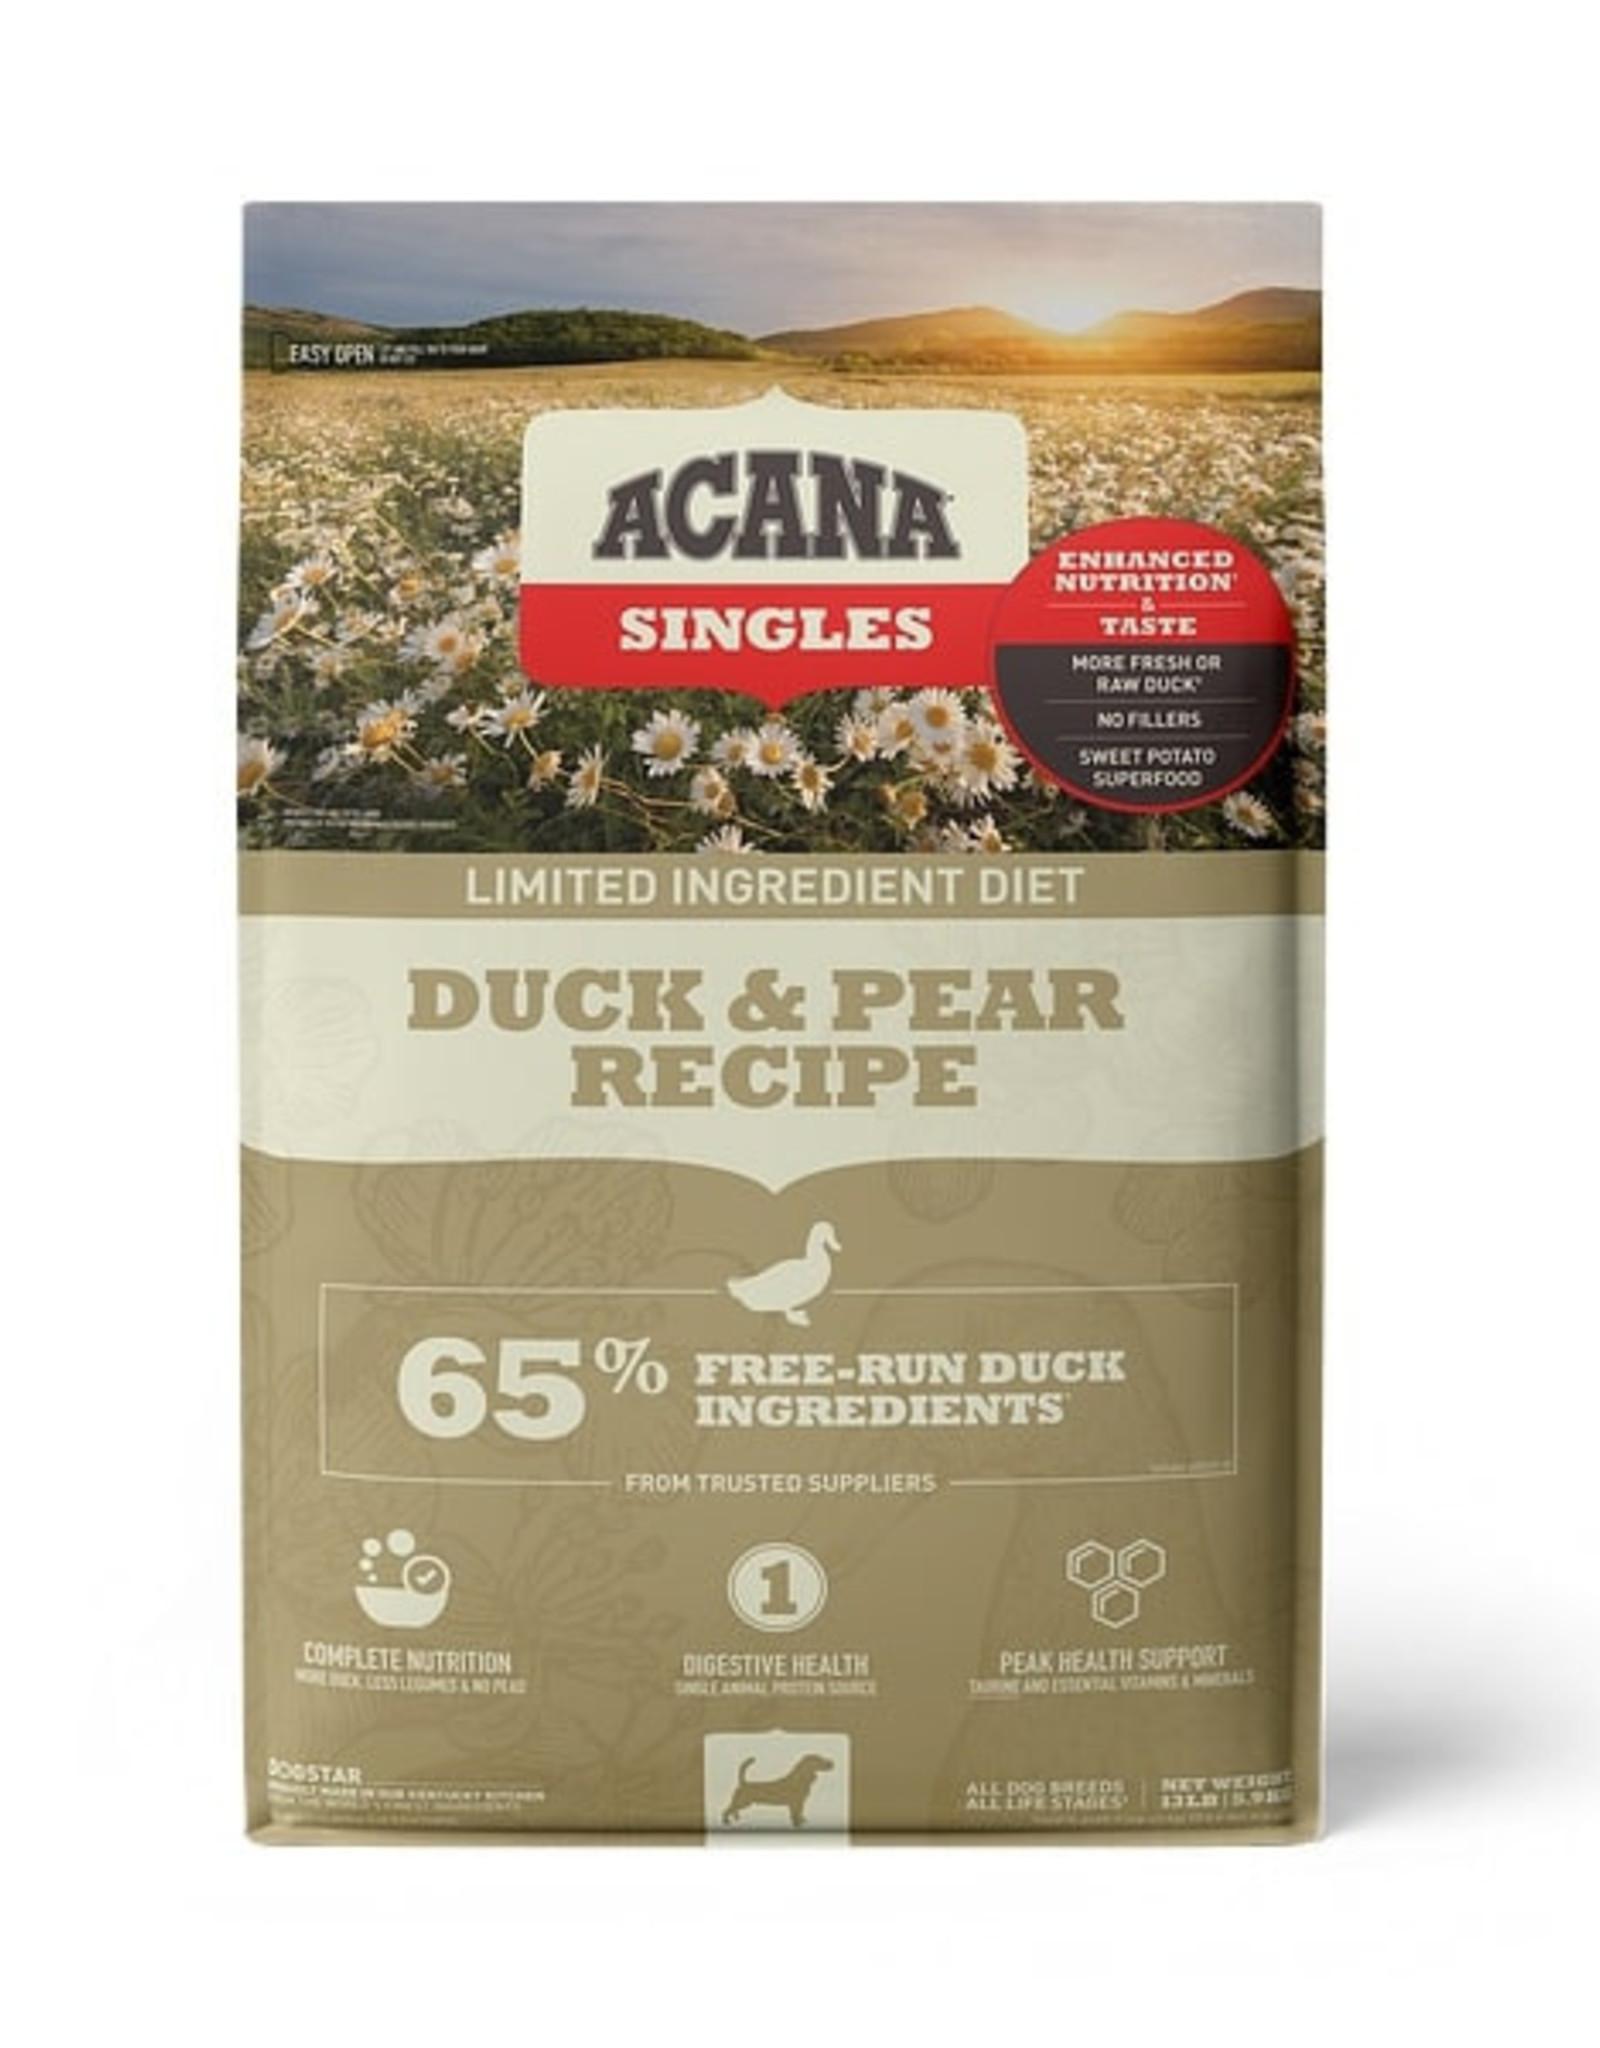 Acana ACANA Singles Limited Ingredient Duck & Pear Grain-Free Dry Dog Food, 13-lb bag